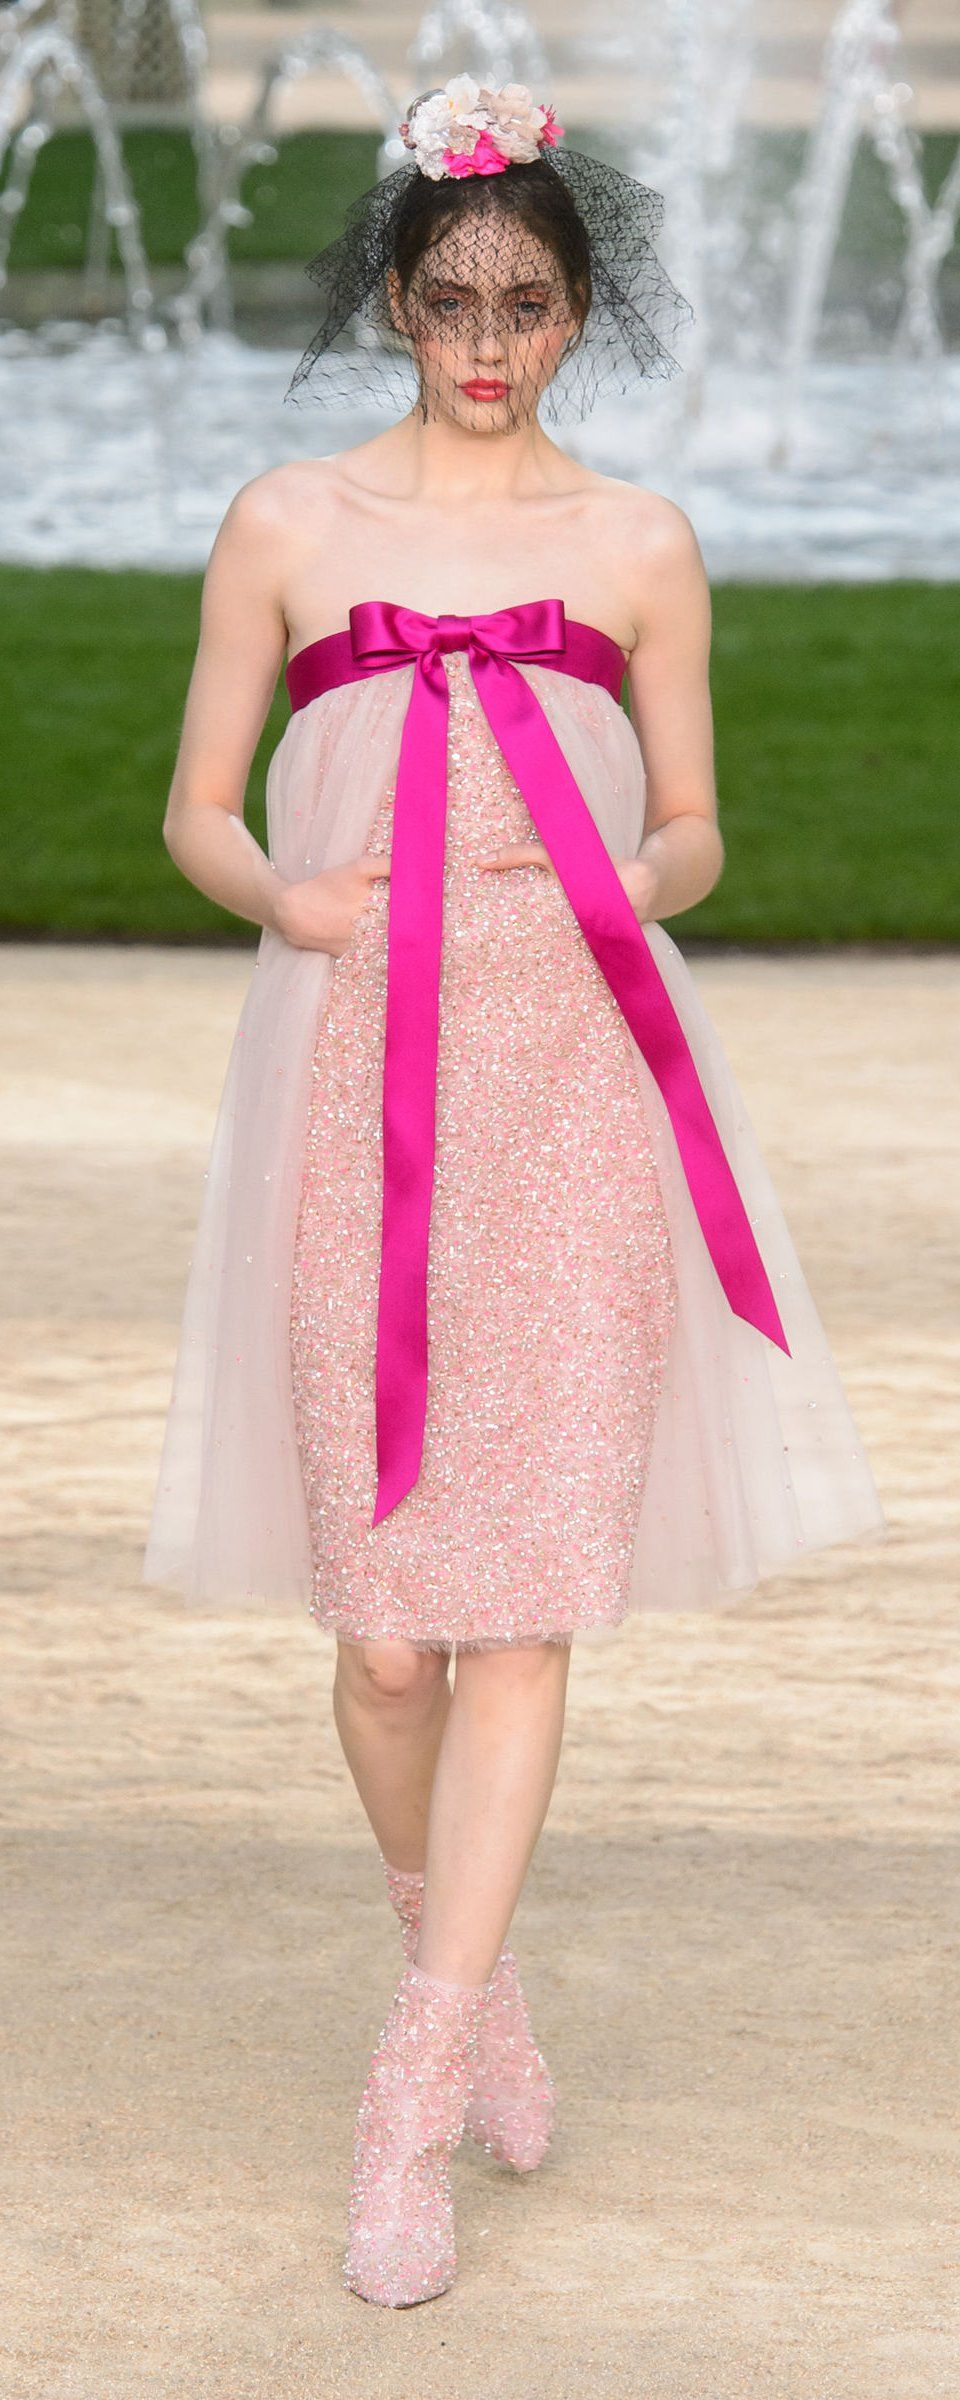 Chanel springsummer couture chanel pinterest chanel